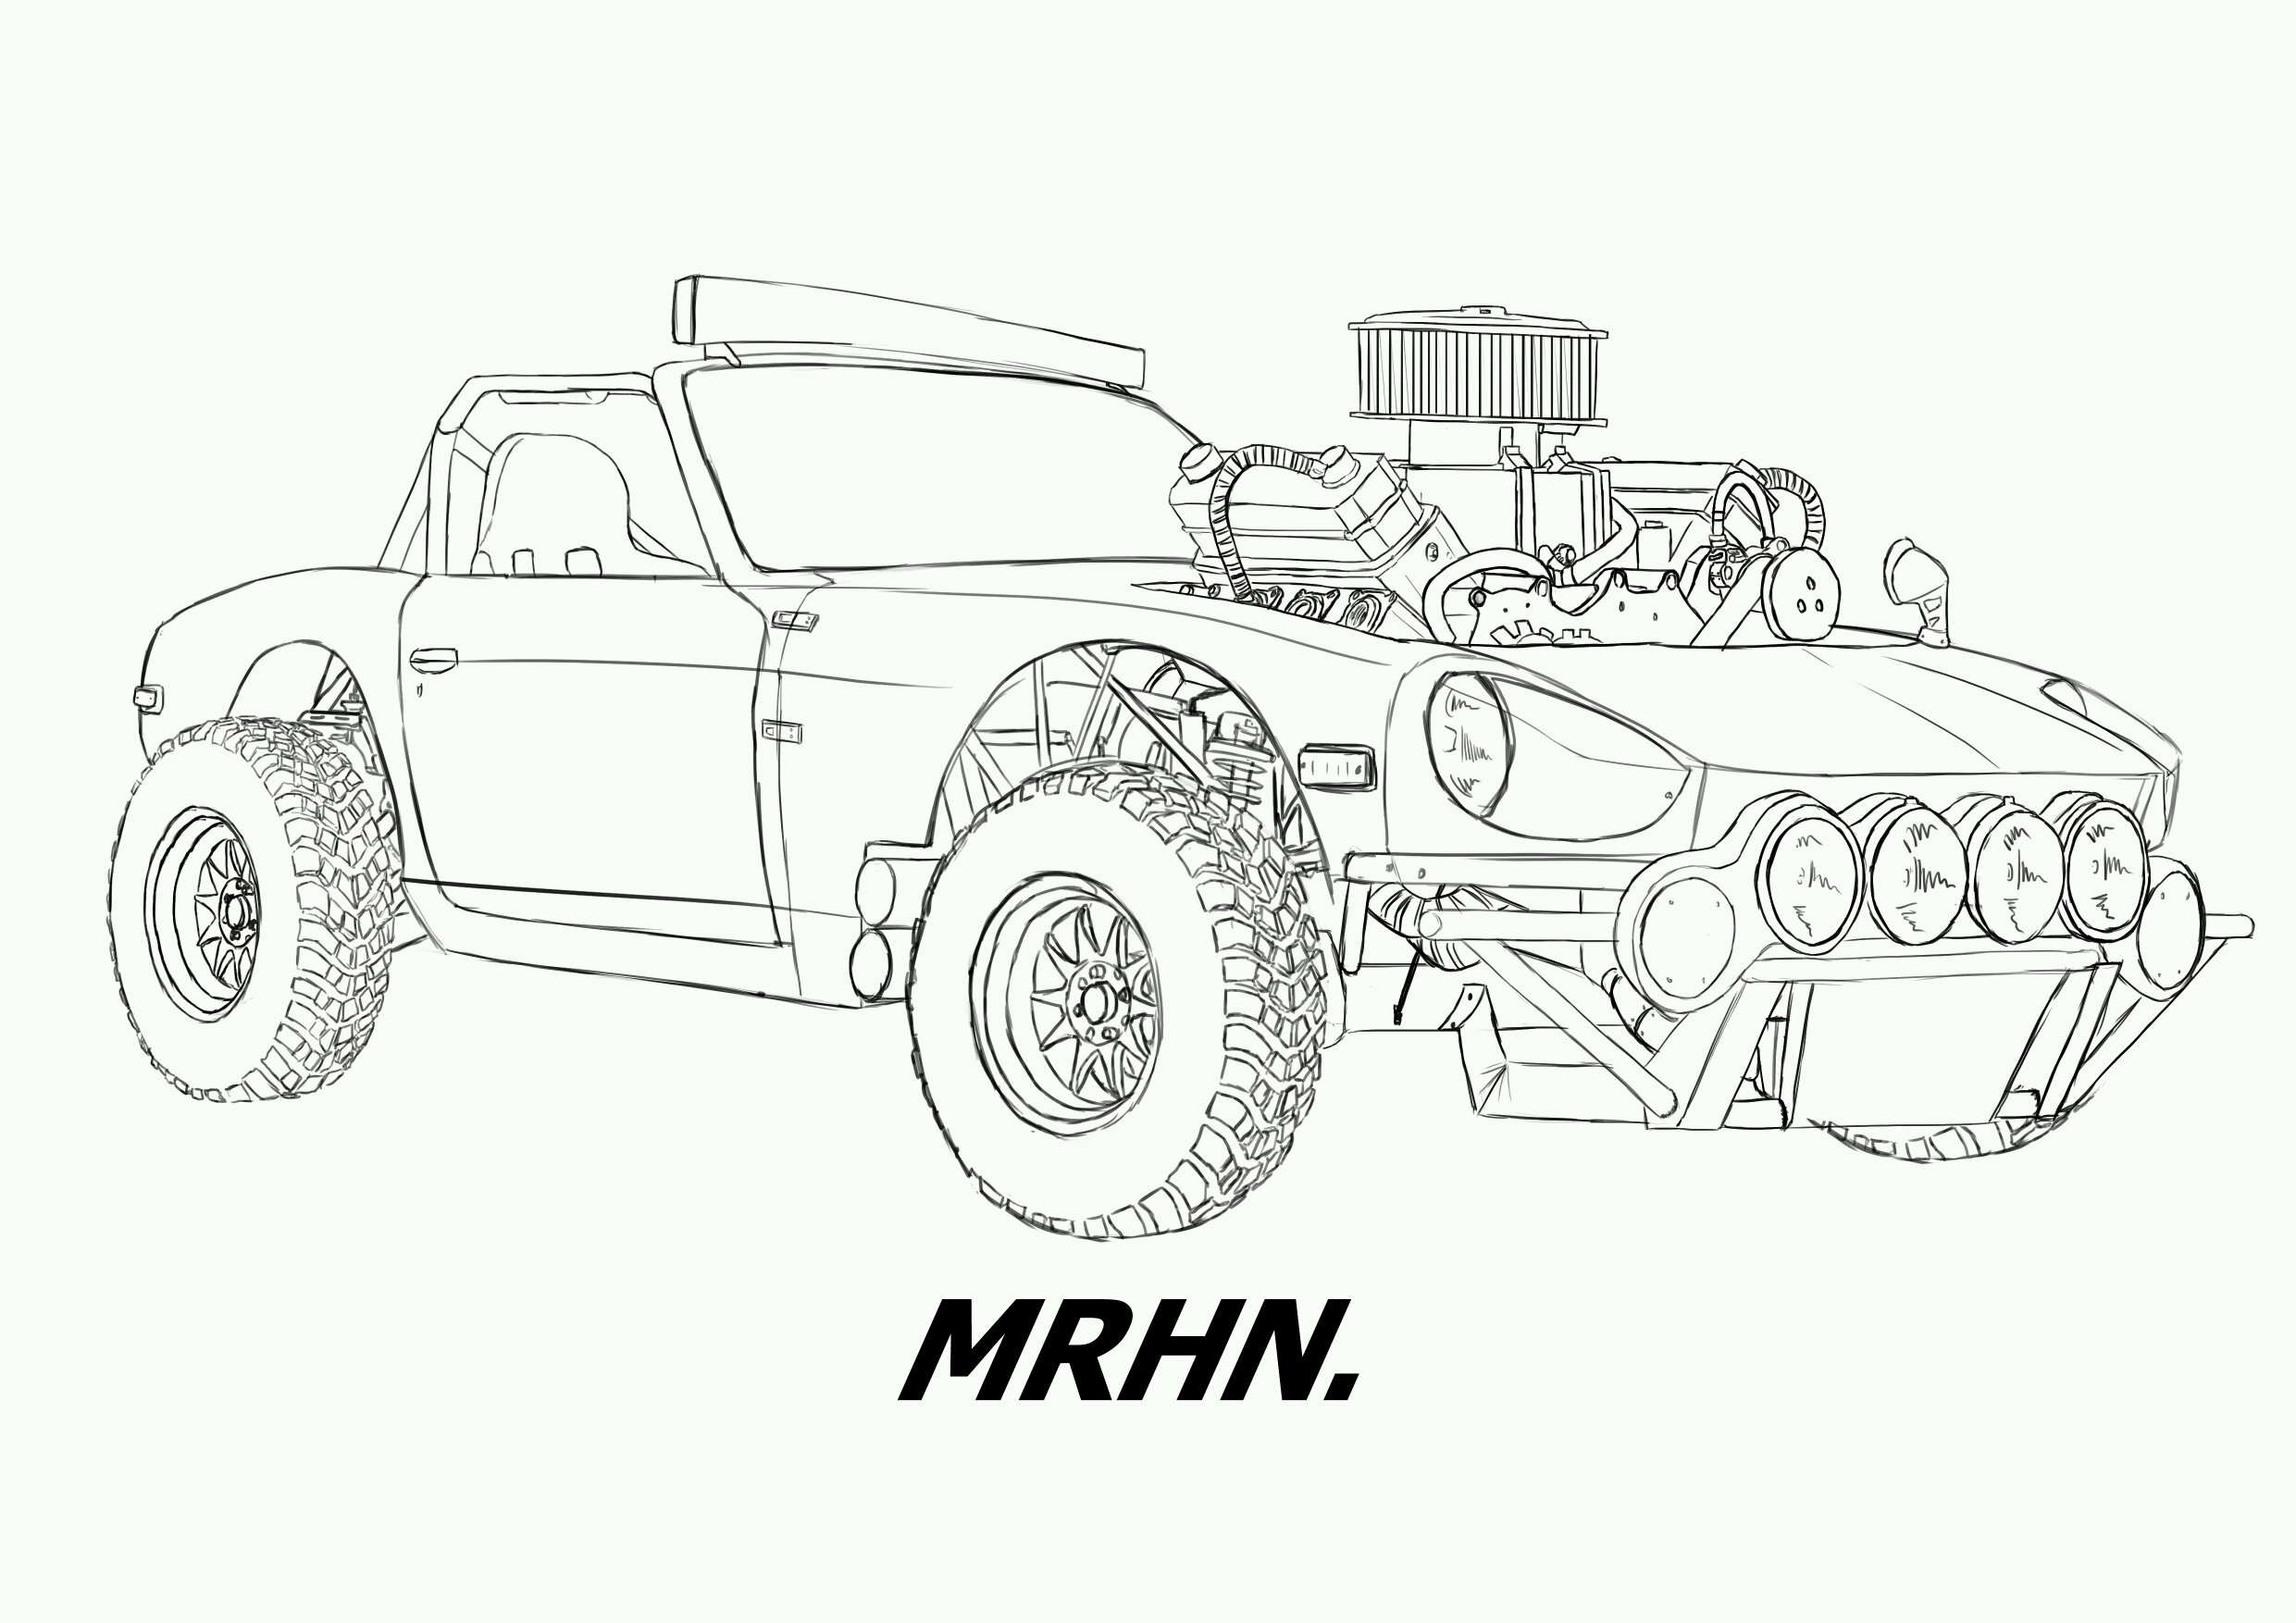 Datsun 240z Offroader Convertible Sketch